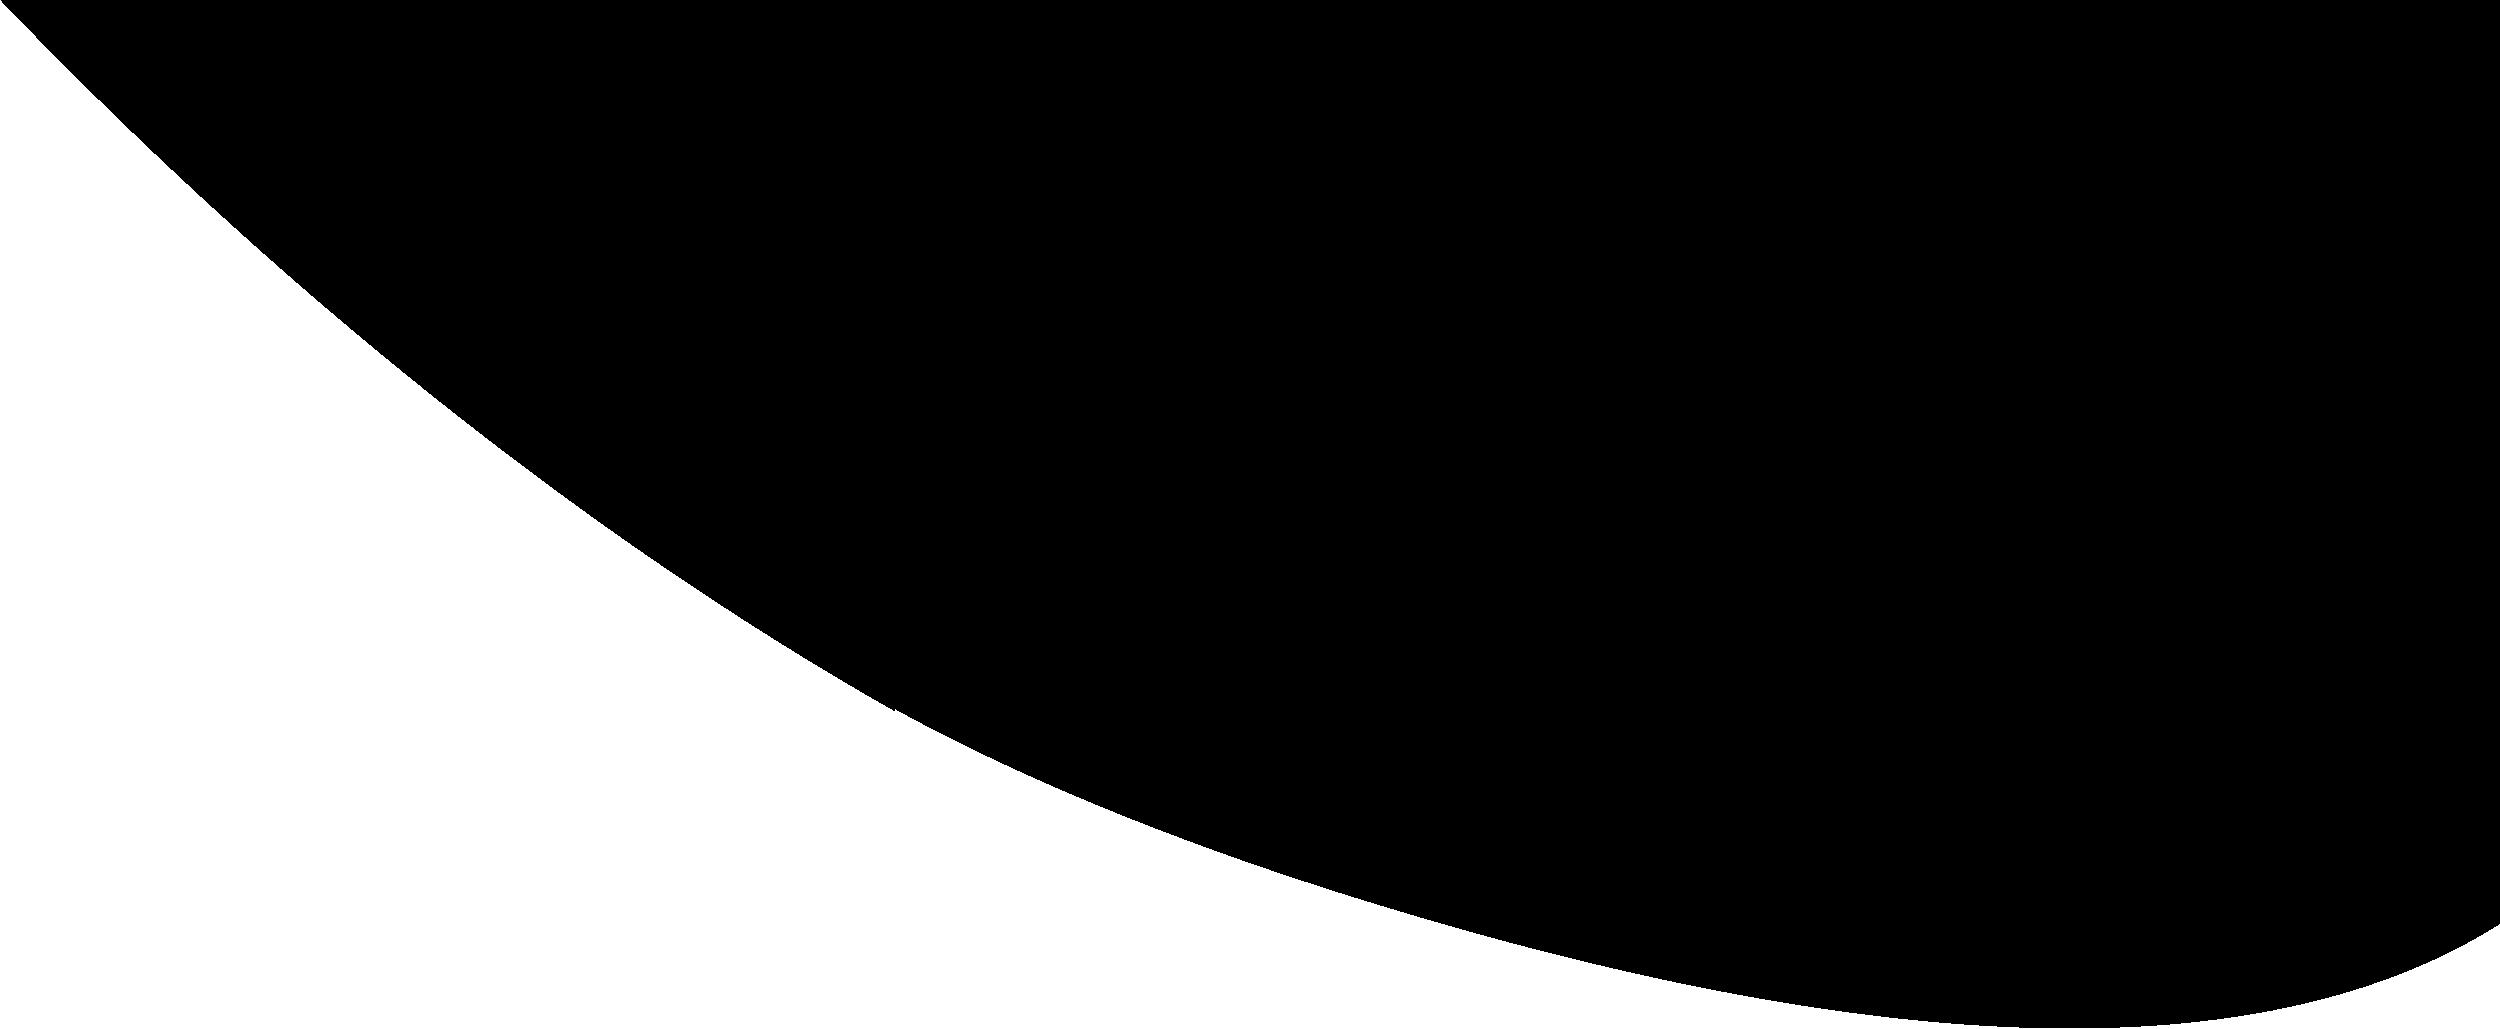 bgn newsletter curve